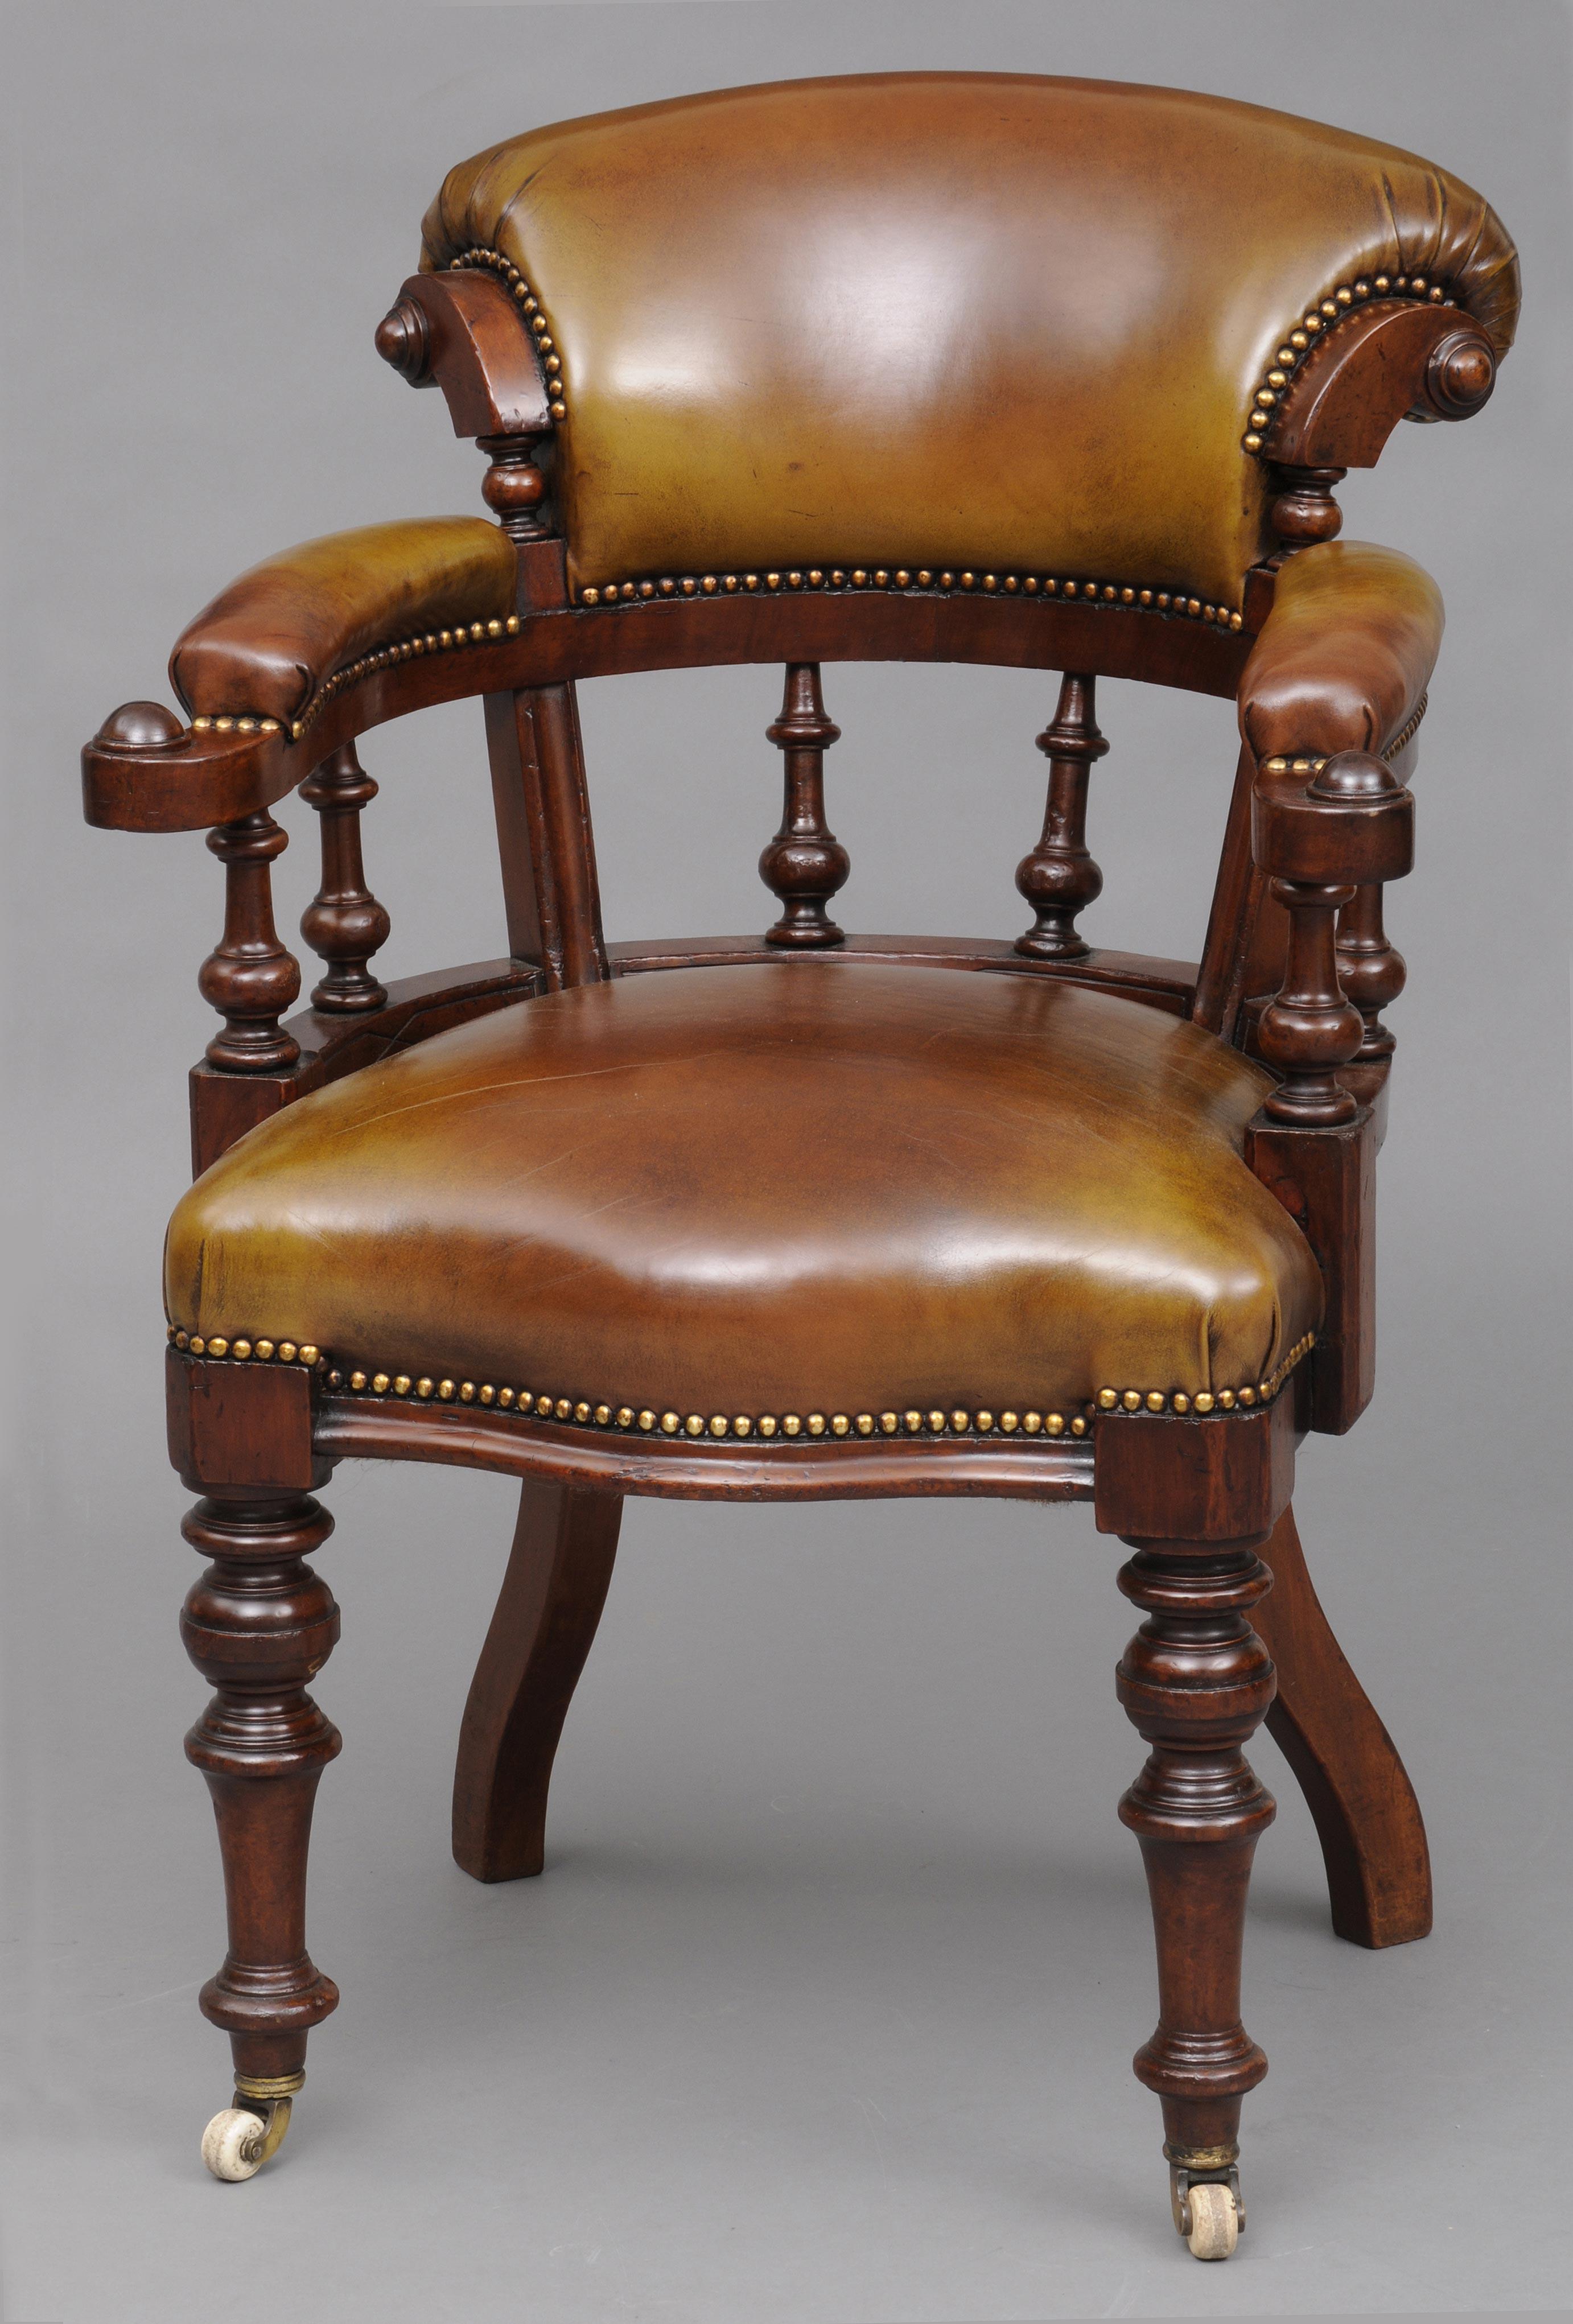 Antique Desk Chair English Antique Mahogany Amp Leather